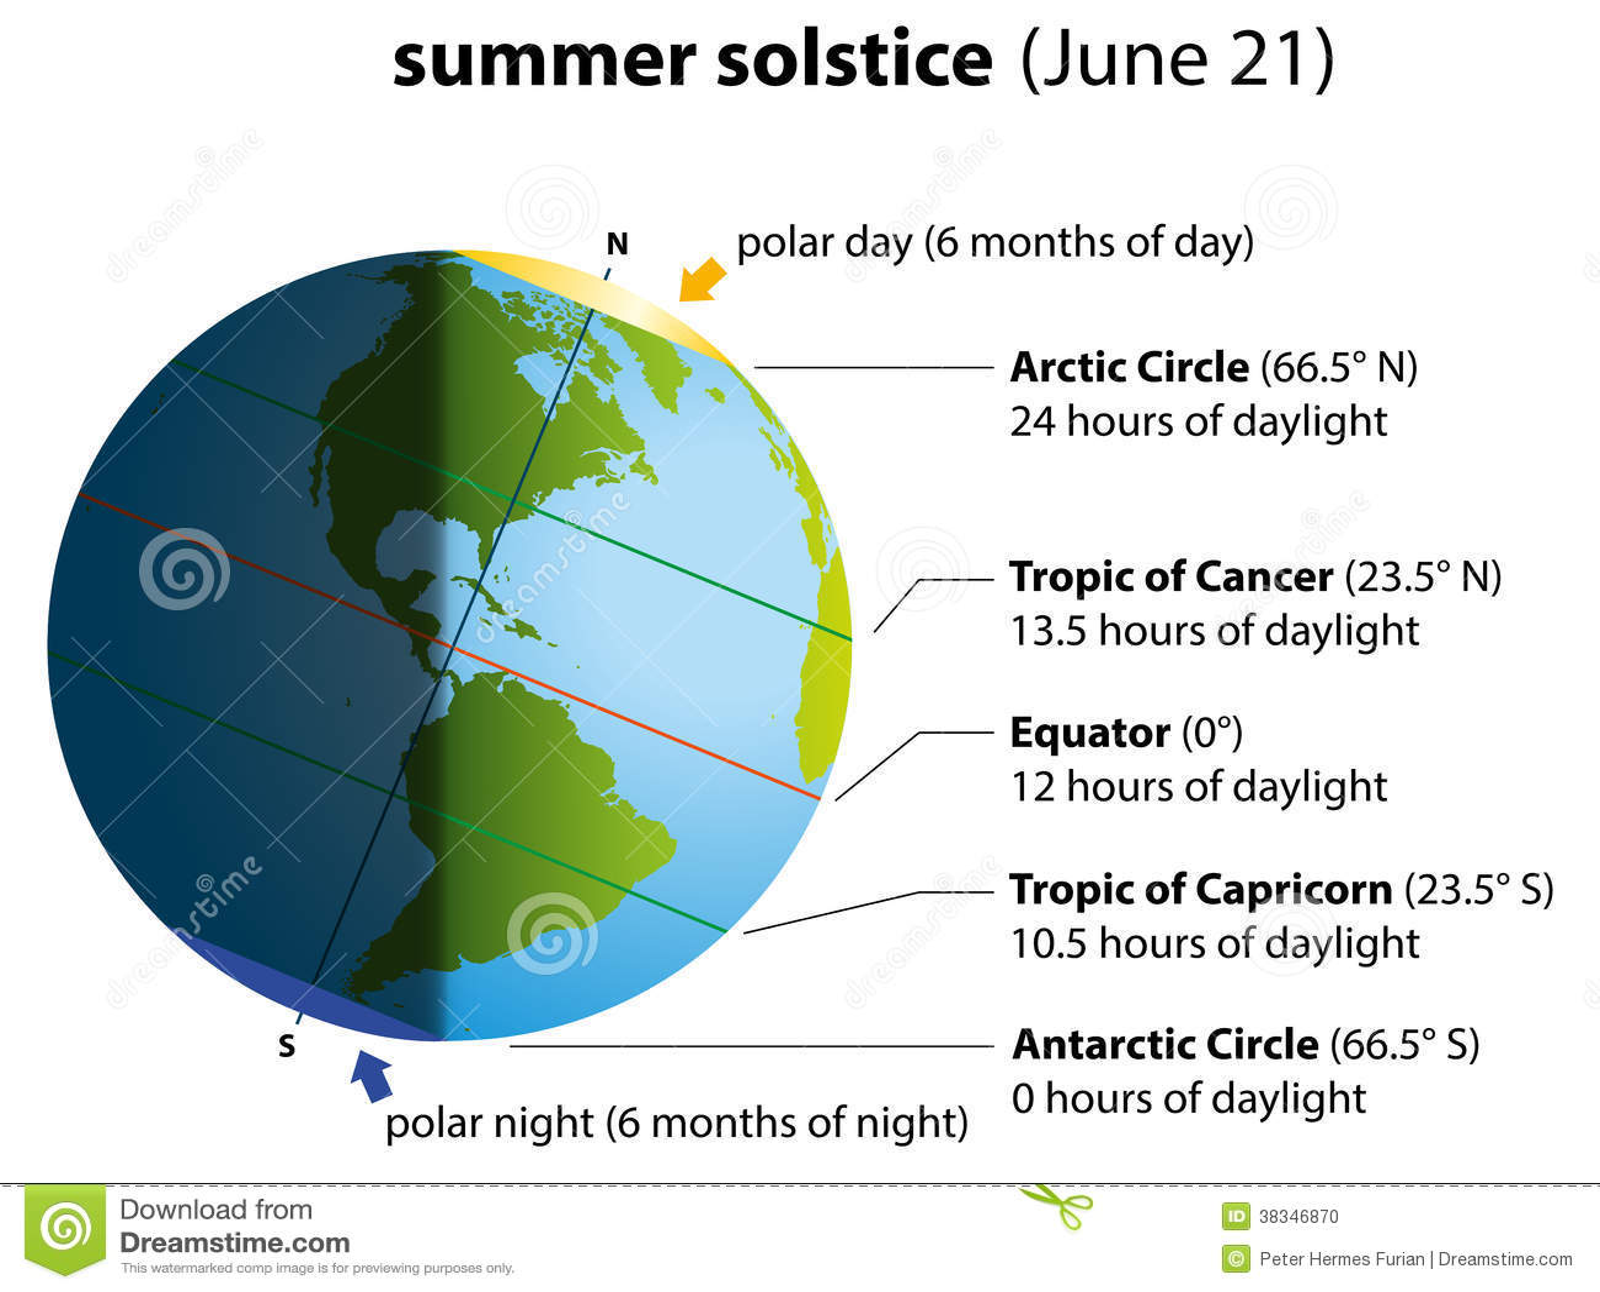 Summer solstice date in Brisbane